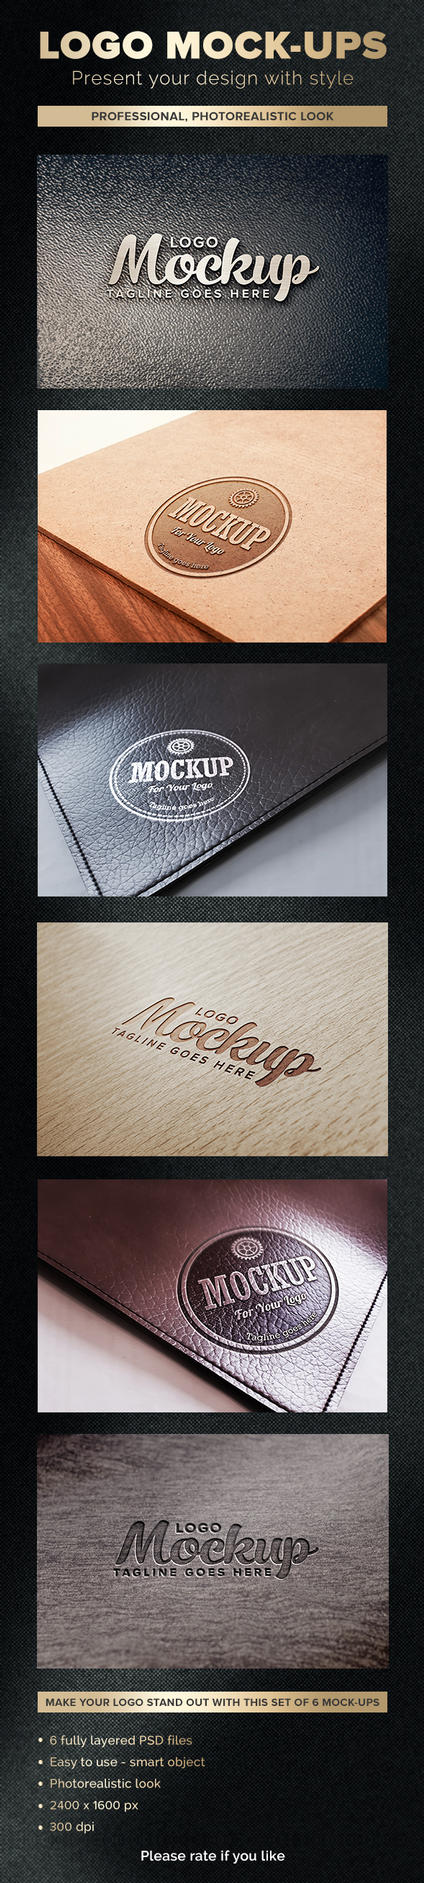 Logo Mockups by Evey90